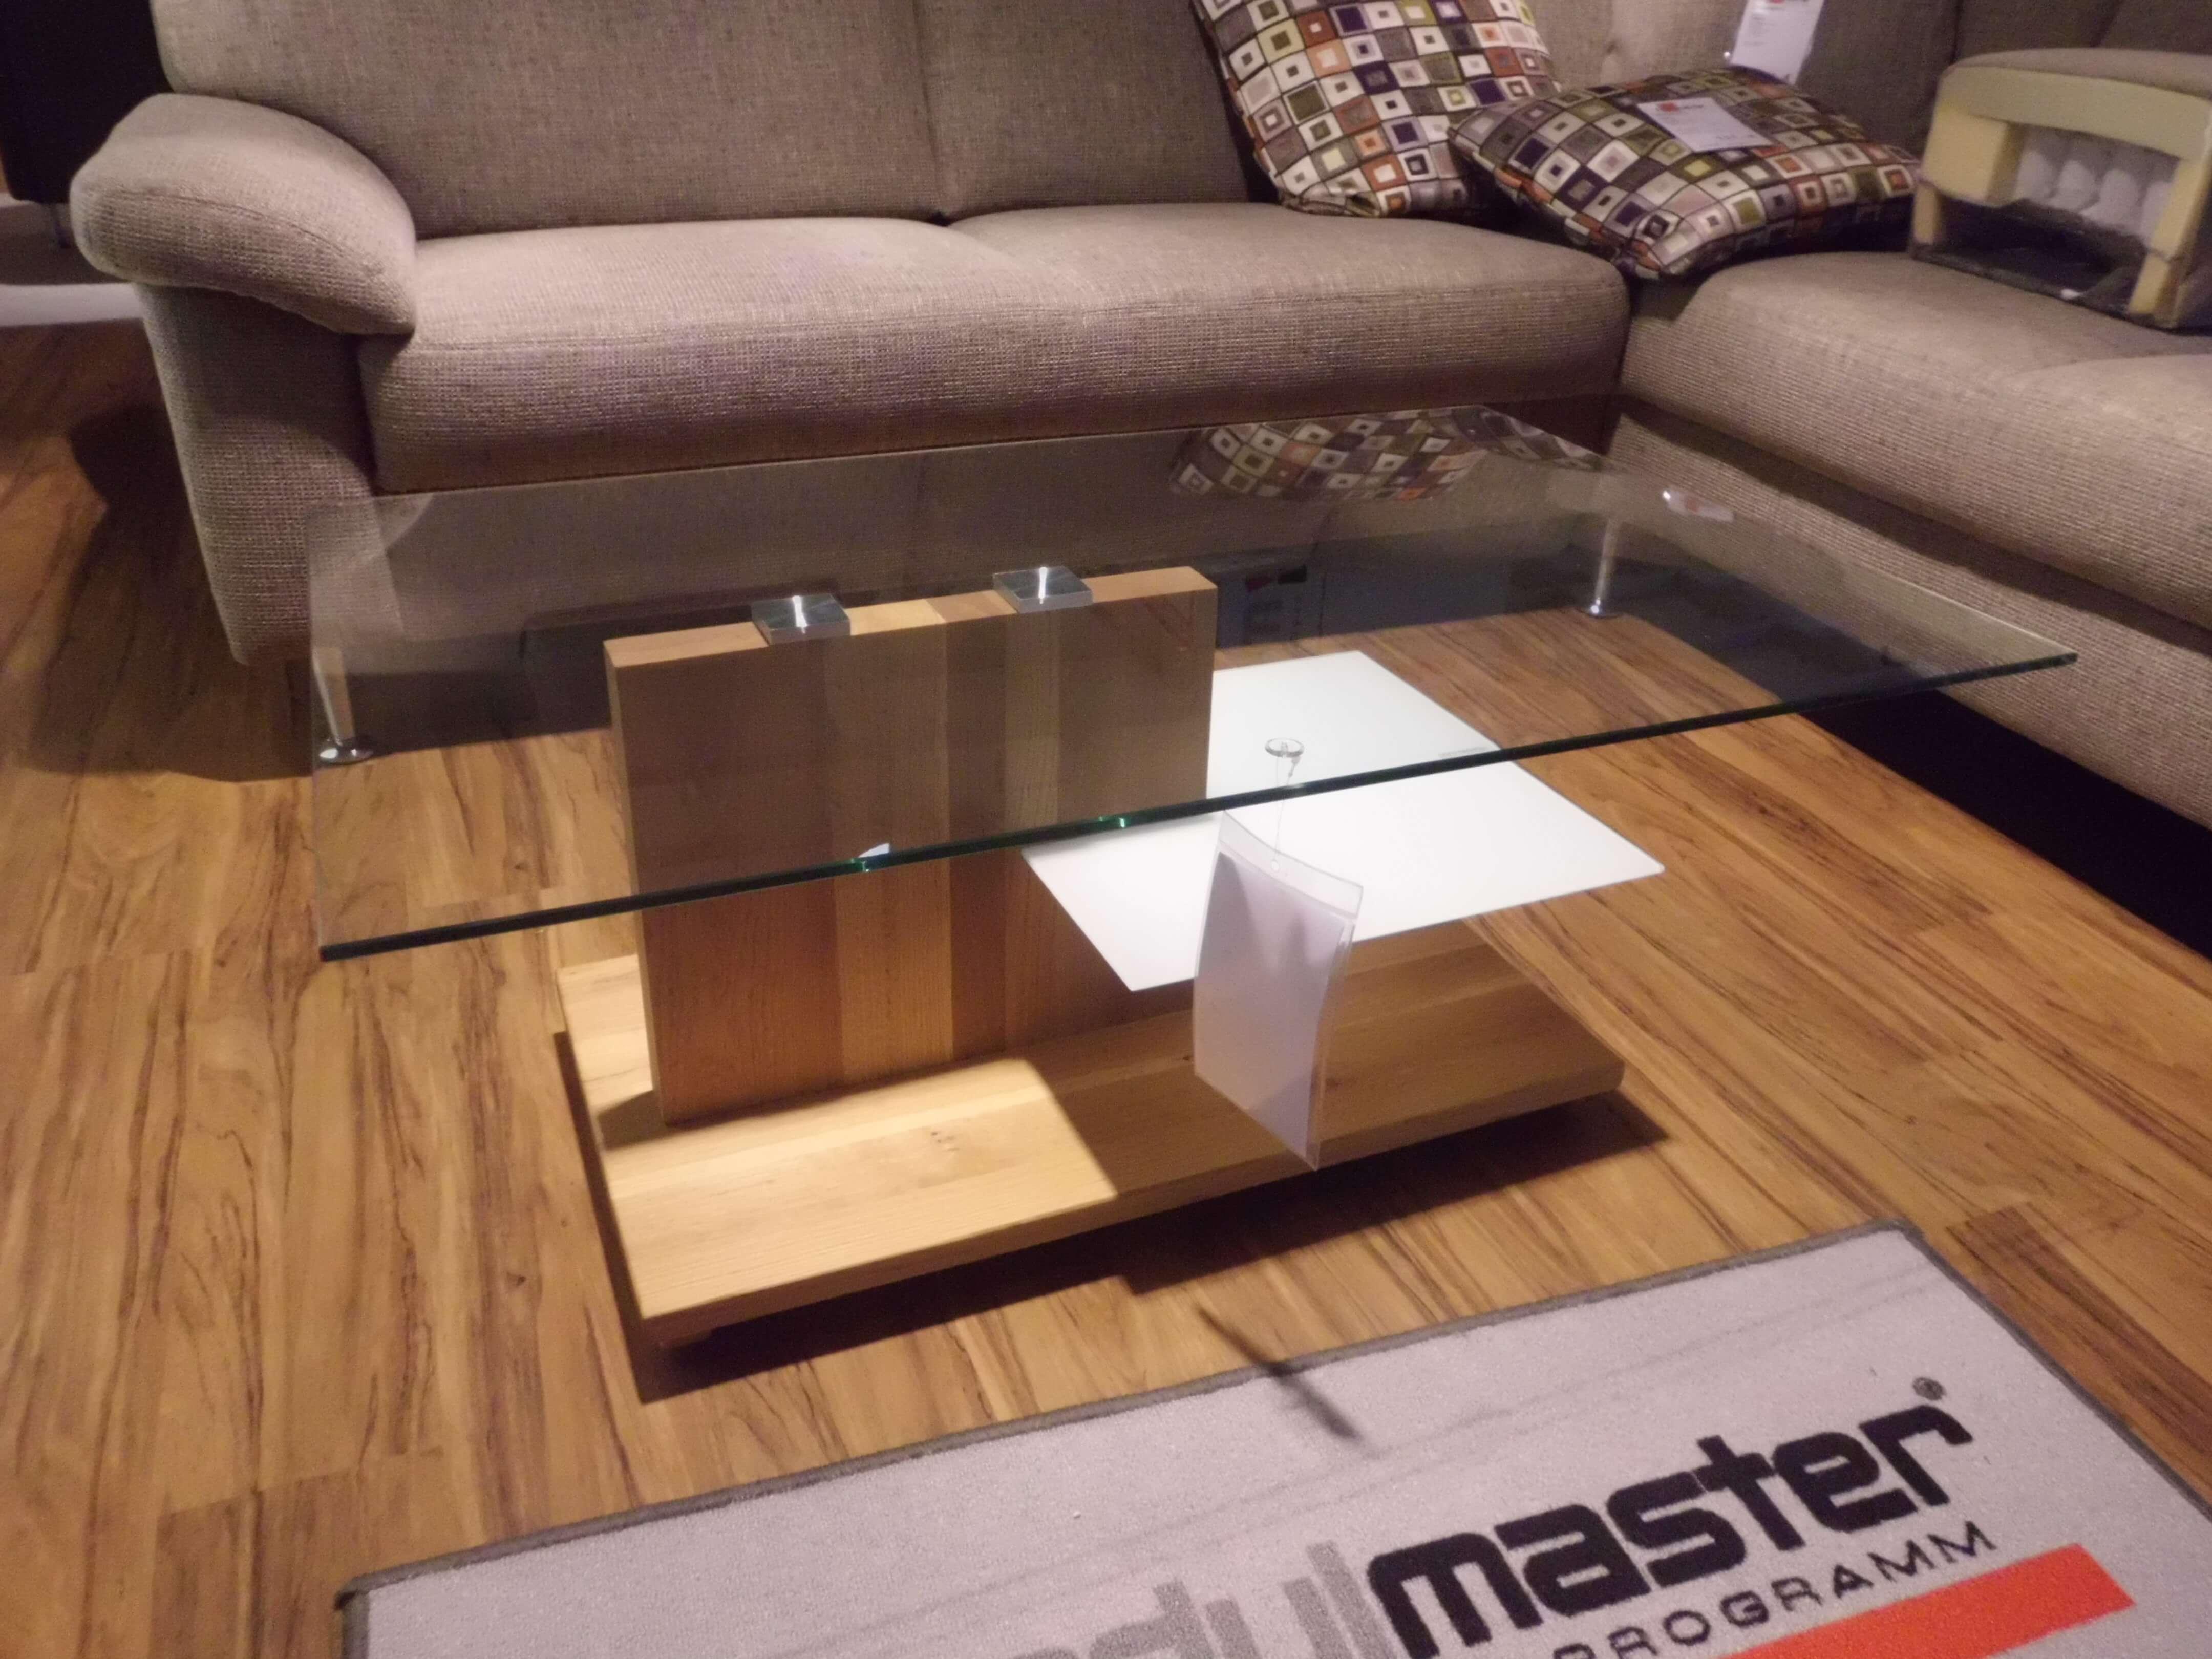 couchtisch reduziert 19413720170923. Black Bedroom Furniture Sets. Home Design Ideas